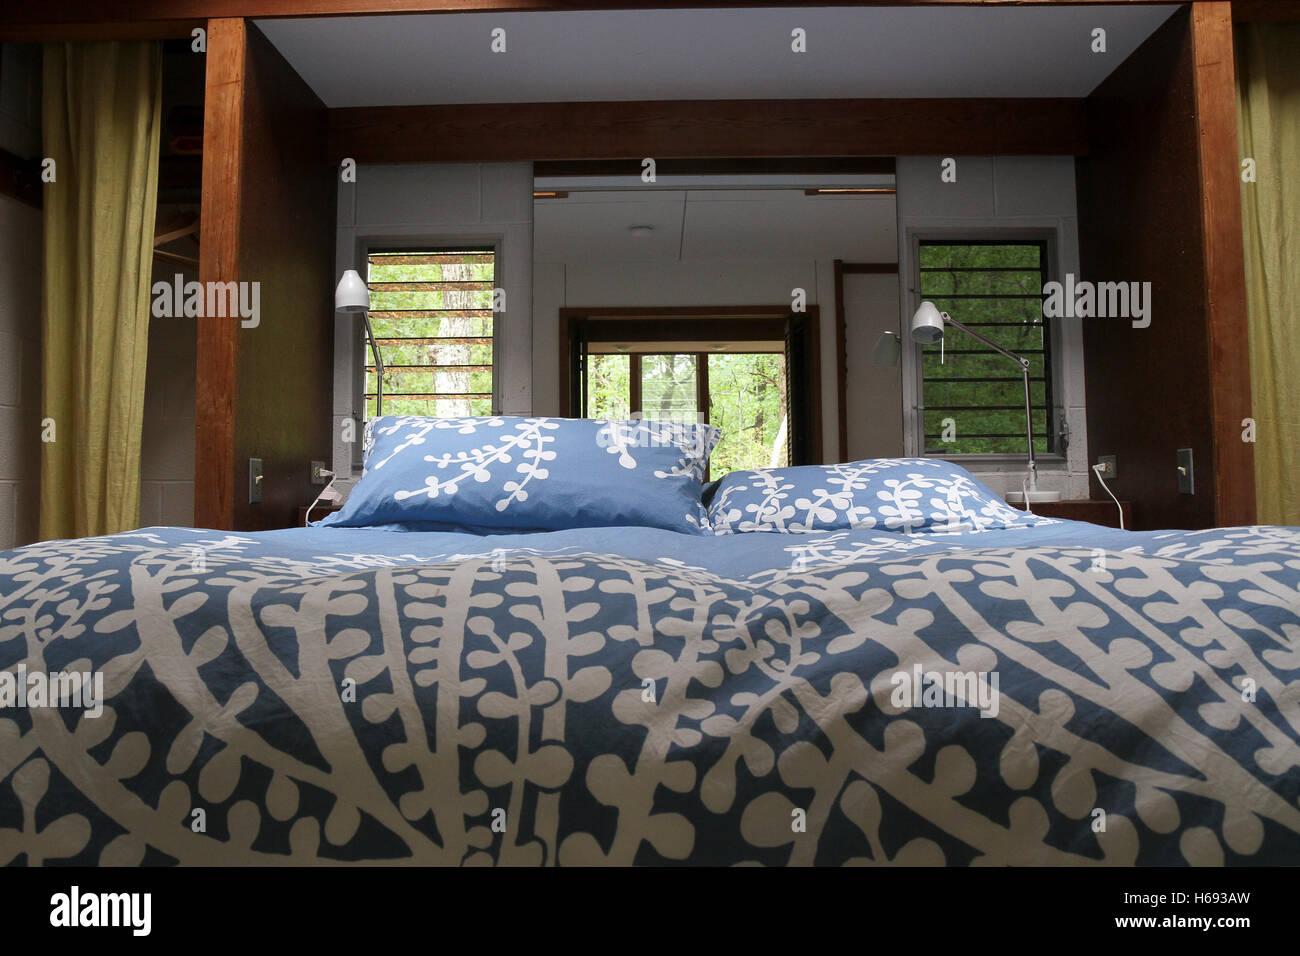 A bedroom in the Kugel-Gips House, Wellfleet, Cape Cod, Massachusetts. - Stock Image